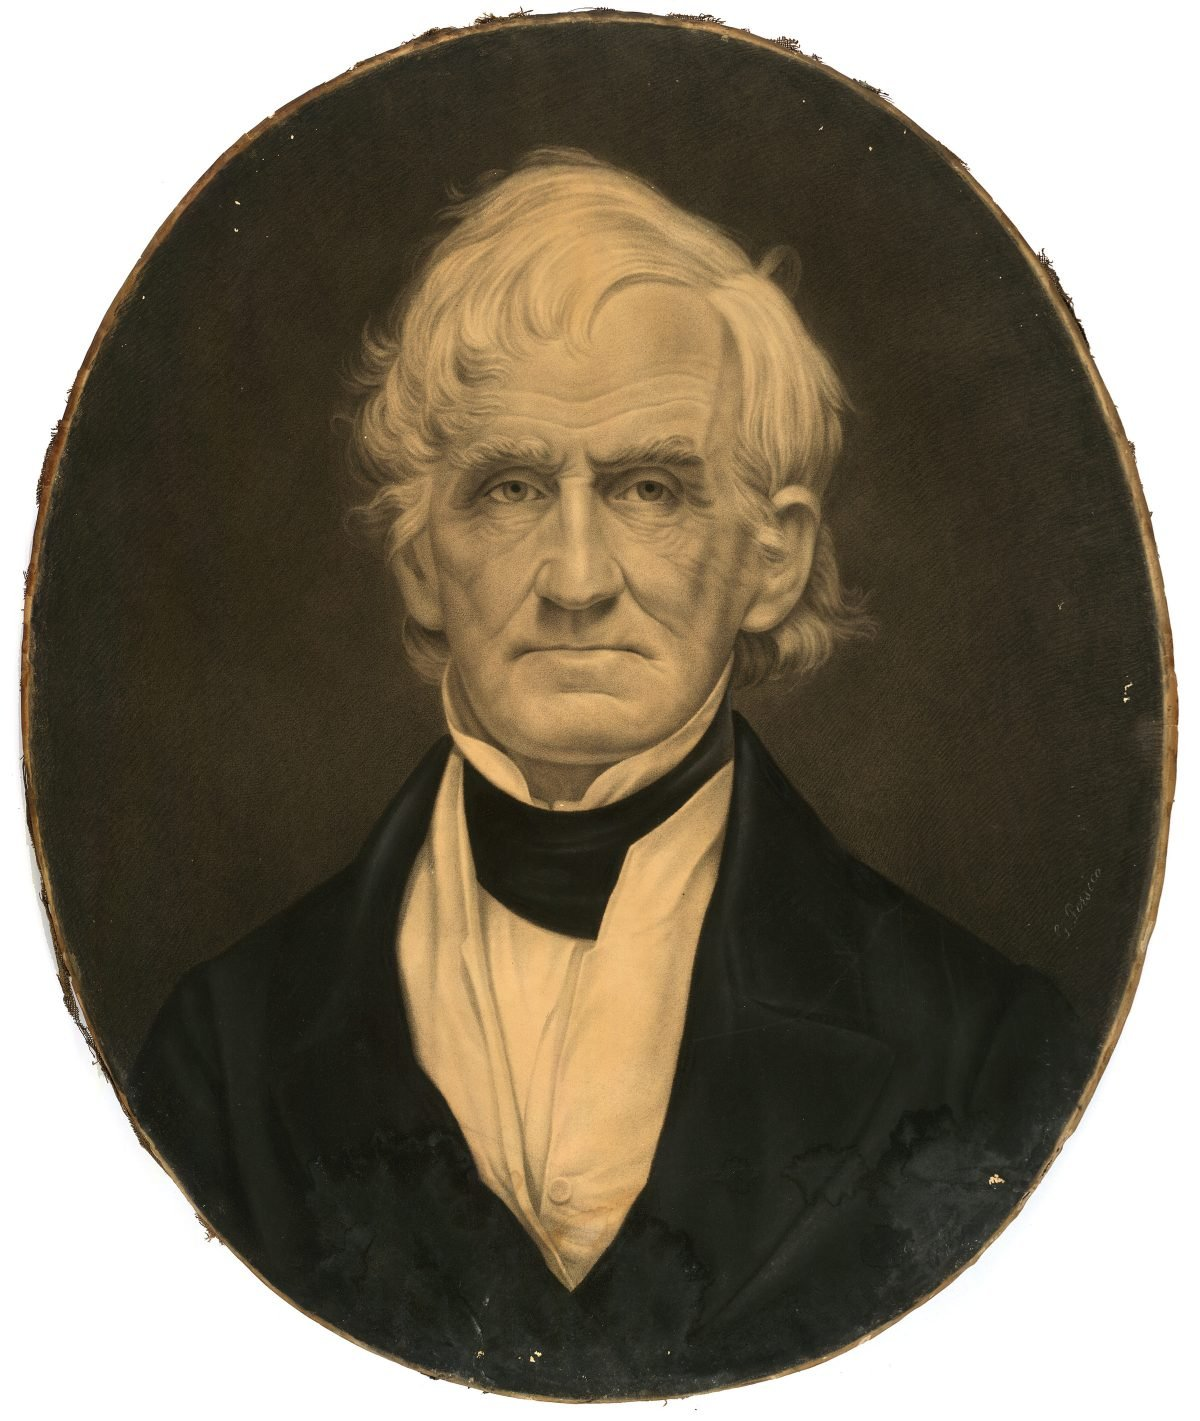 Joseph C. Cabell